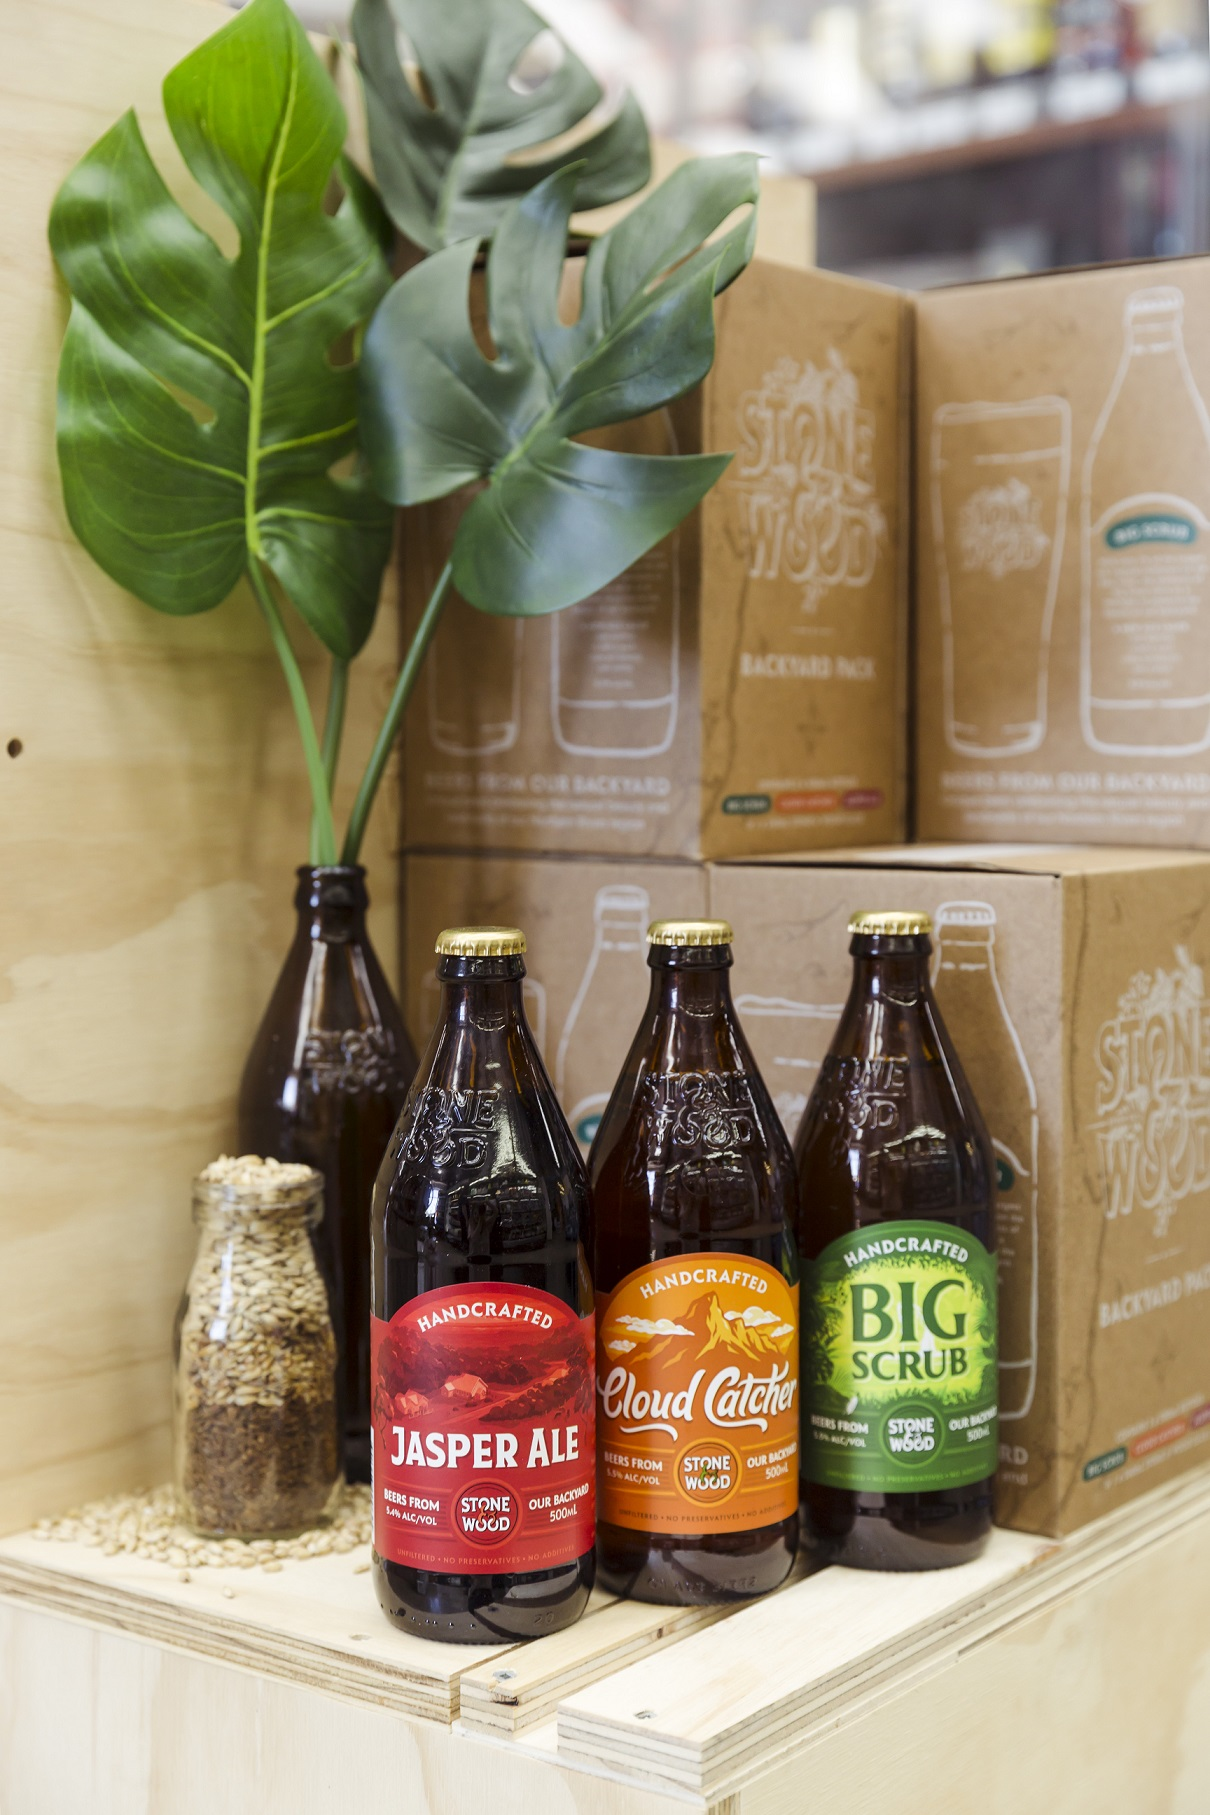 Grosvenor Grocery & Bottle Shop | Monthly wine tastings